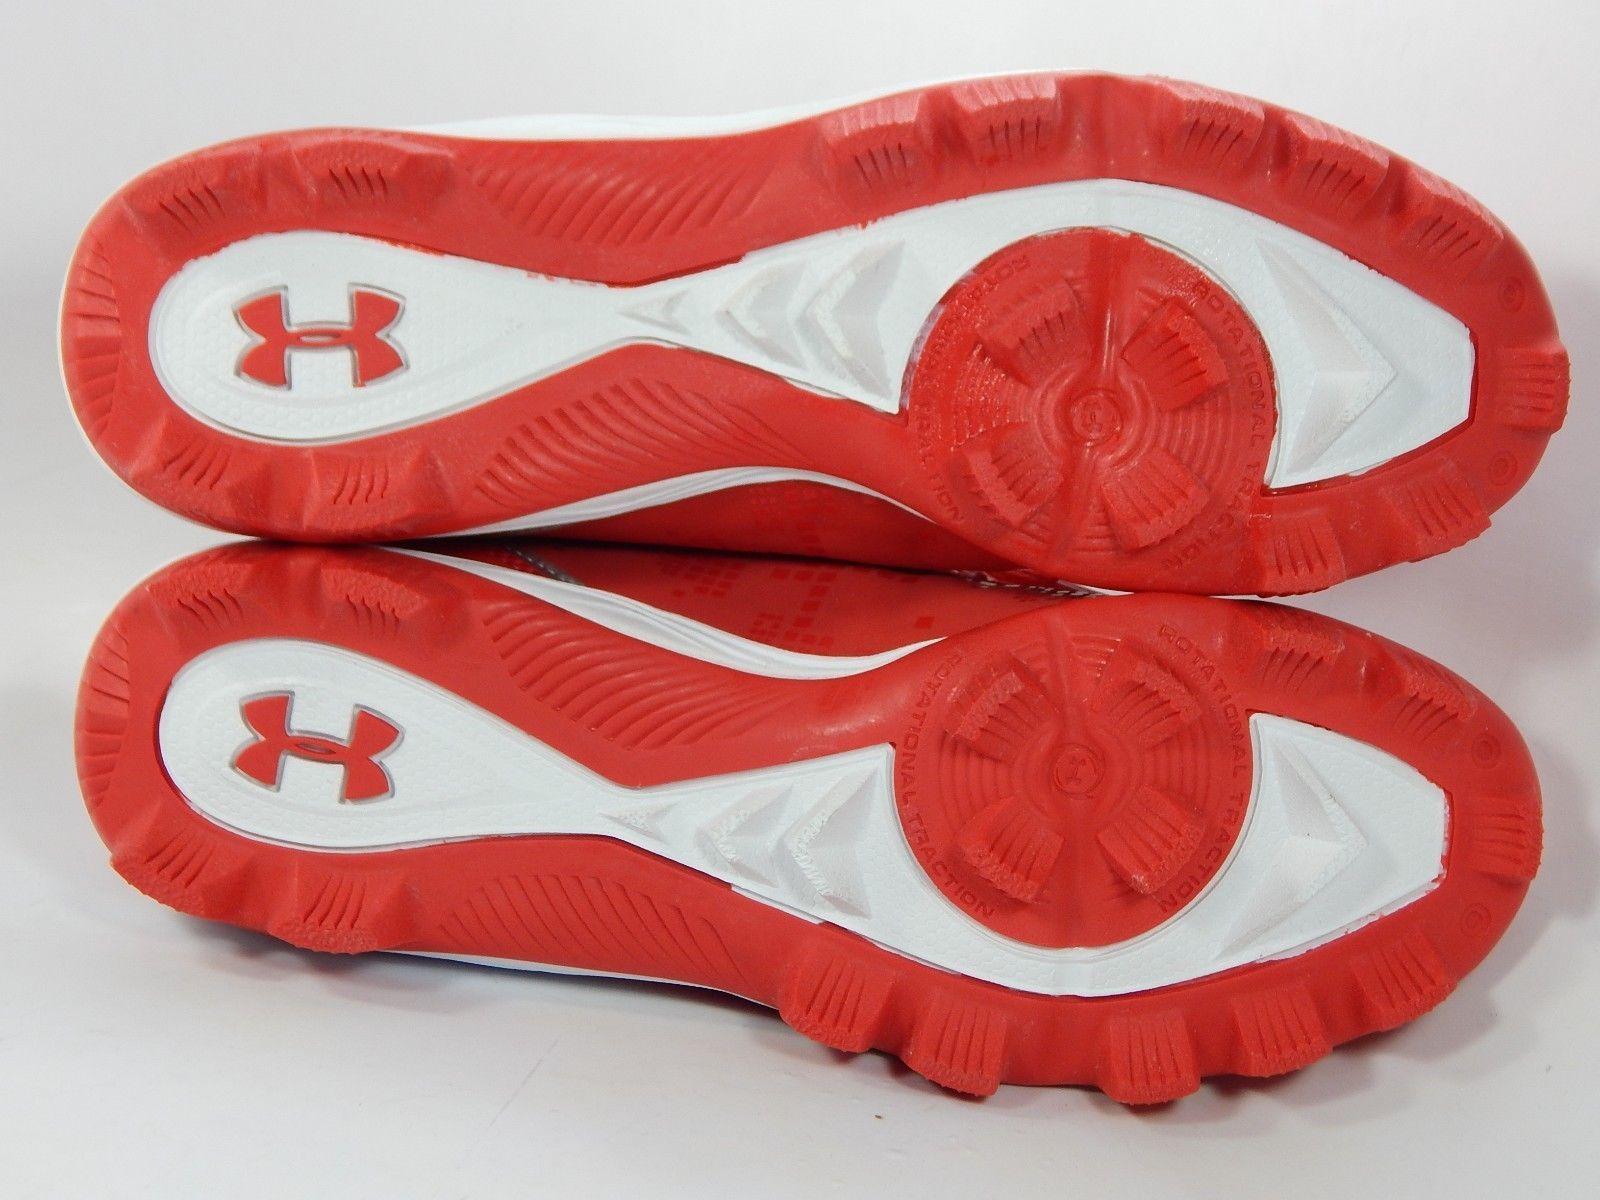 Under Armour Glyde RM CC Size US 10 M EU 42 Women's Softball Cleats 1233552-611